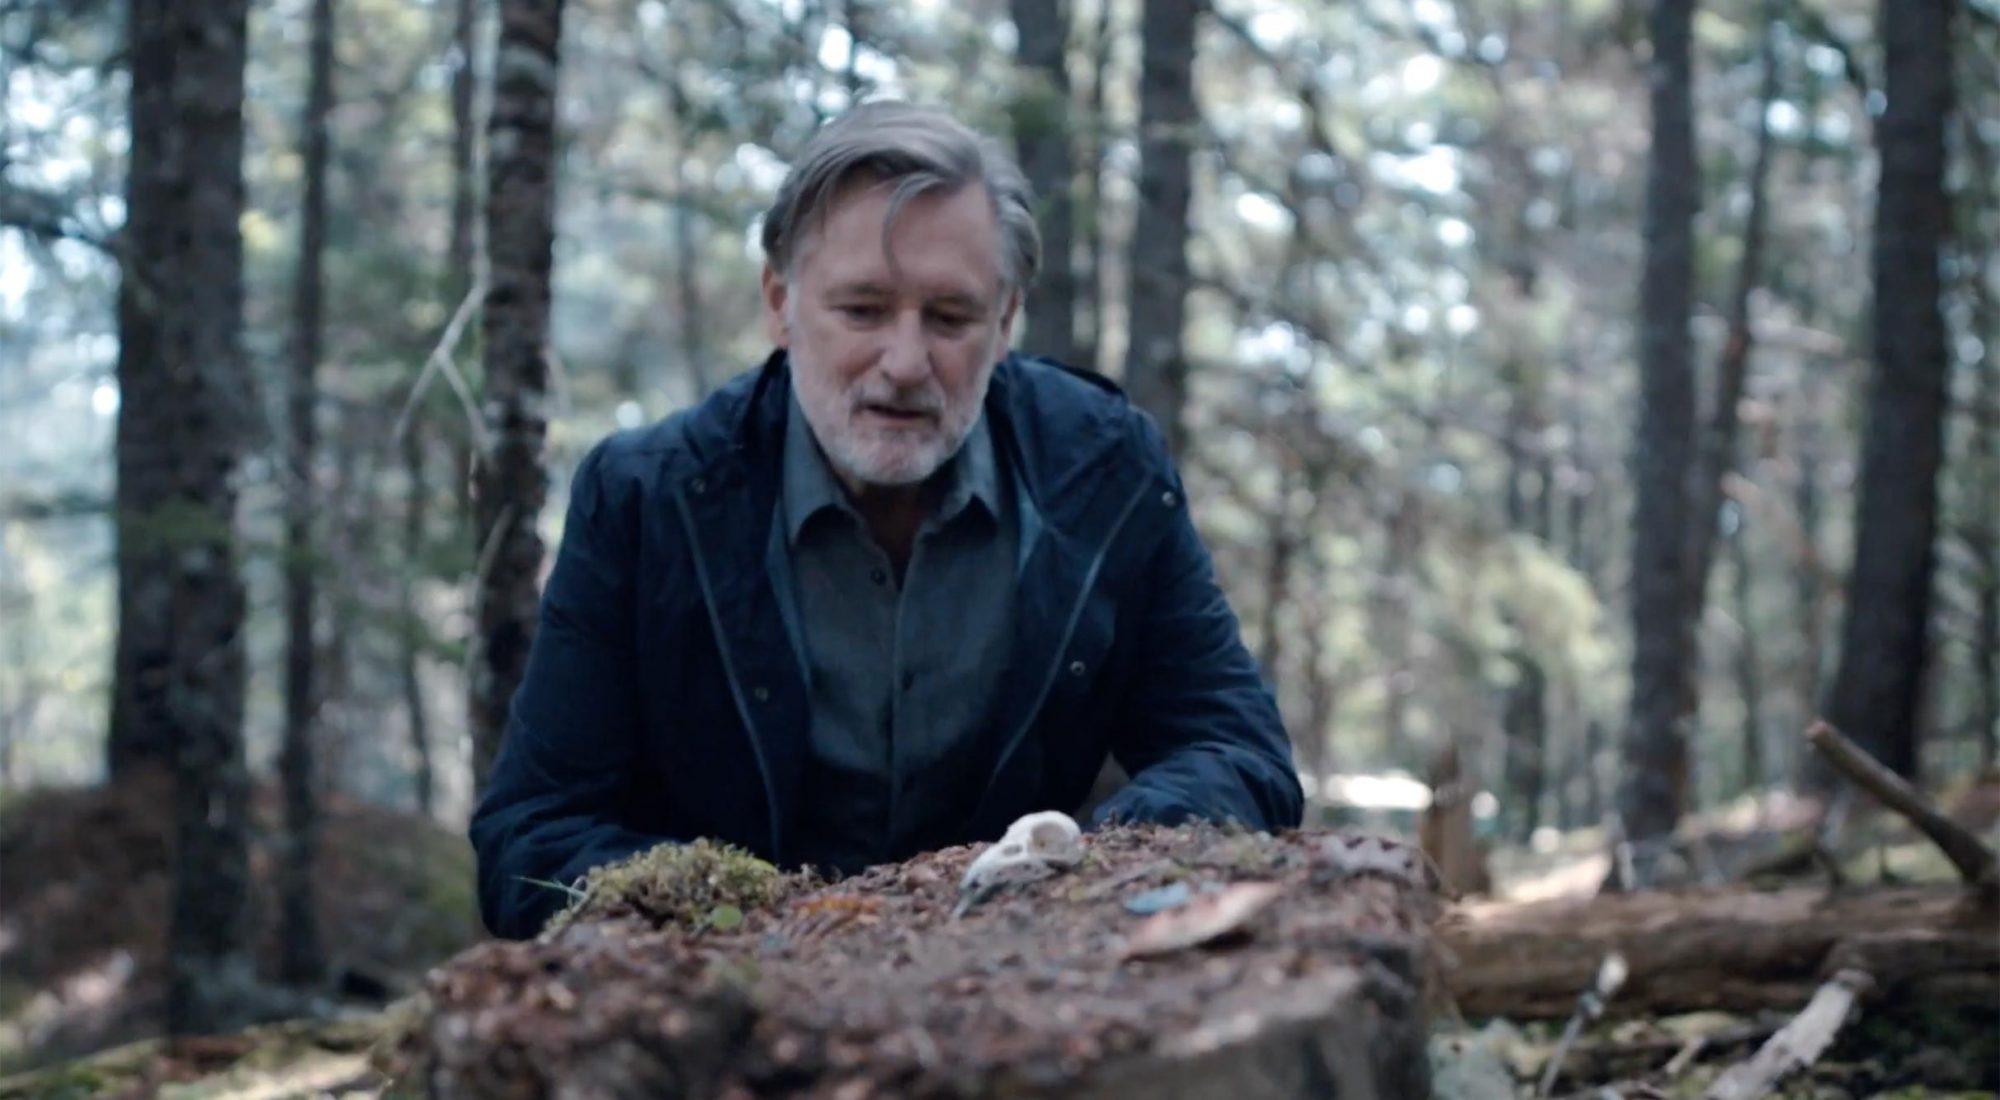 The Sinner season 4 trailer